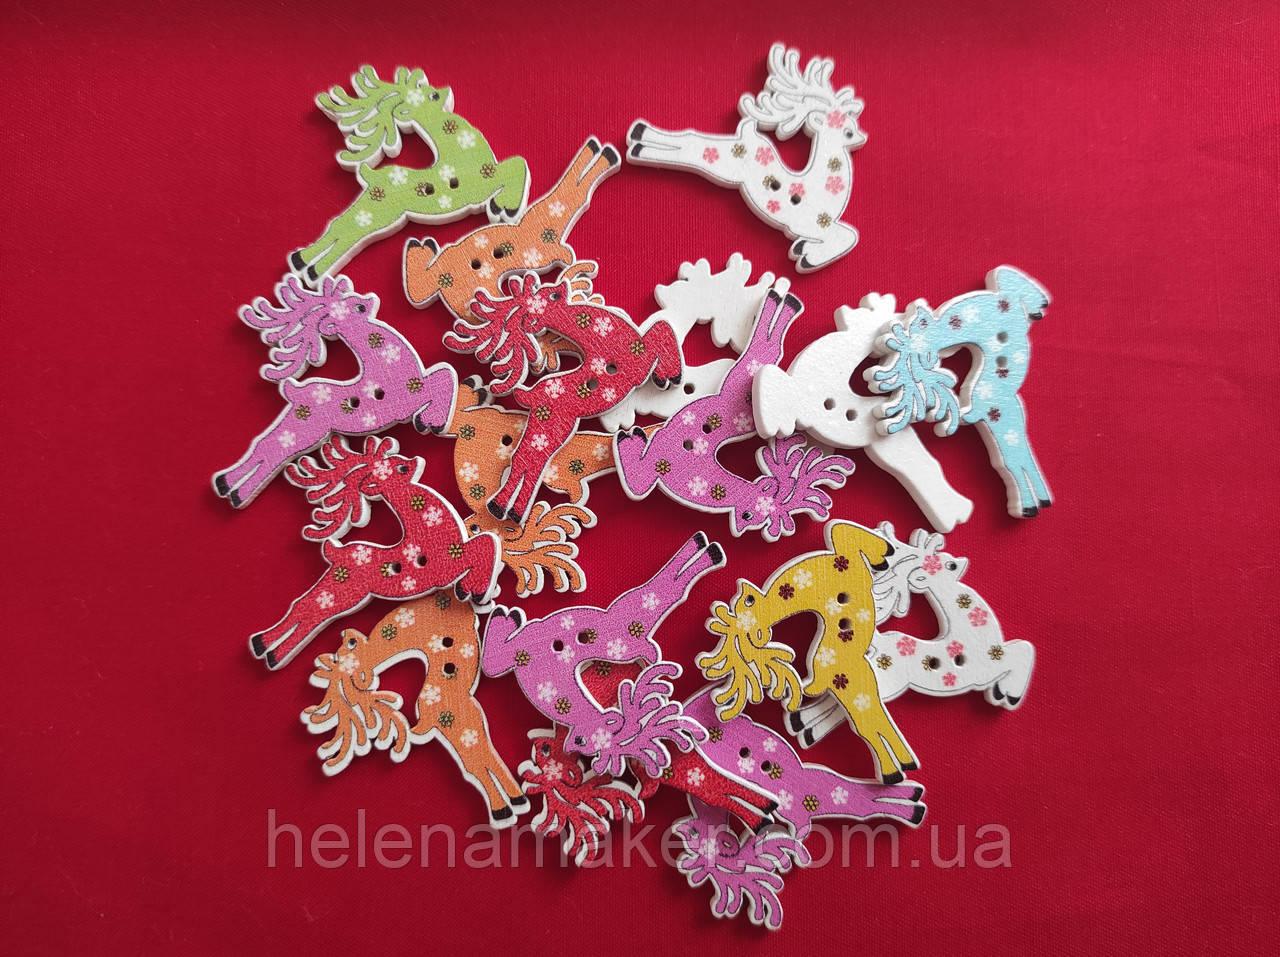 Деревянная декоративная пуговица Новогодний олень 30*35 мм